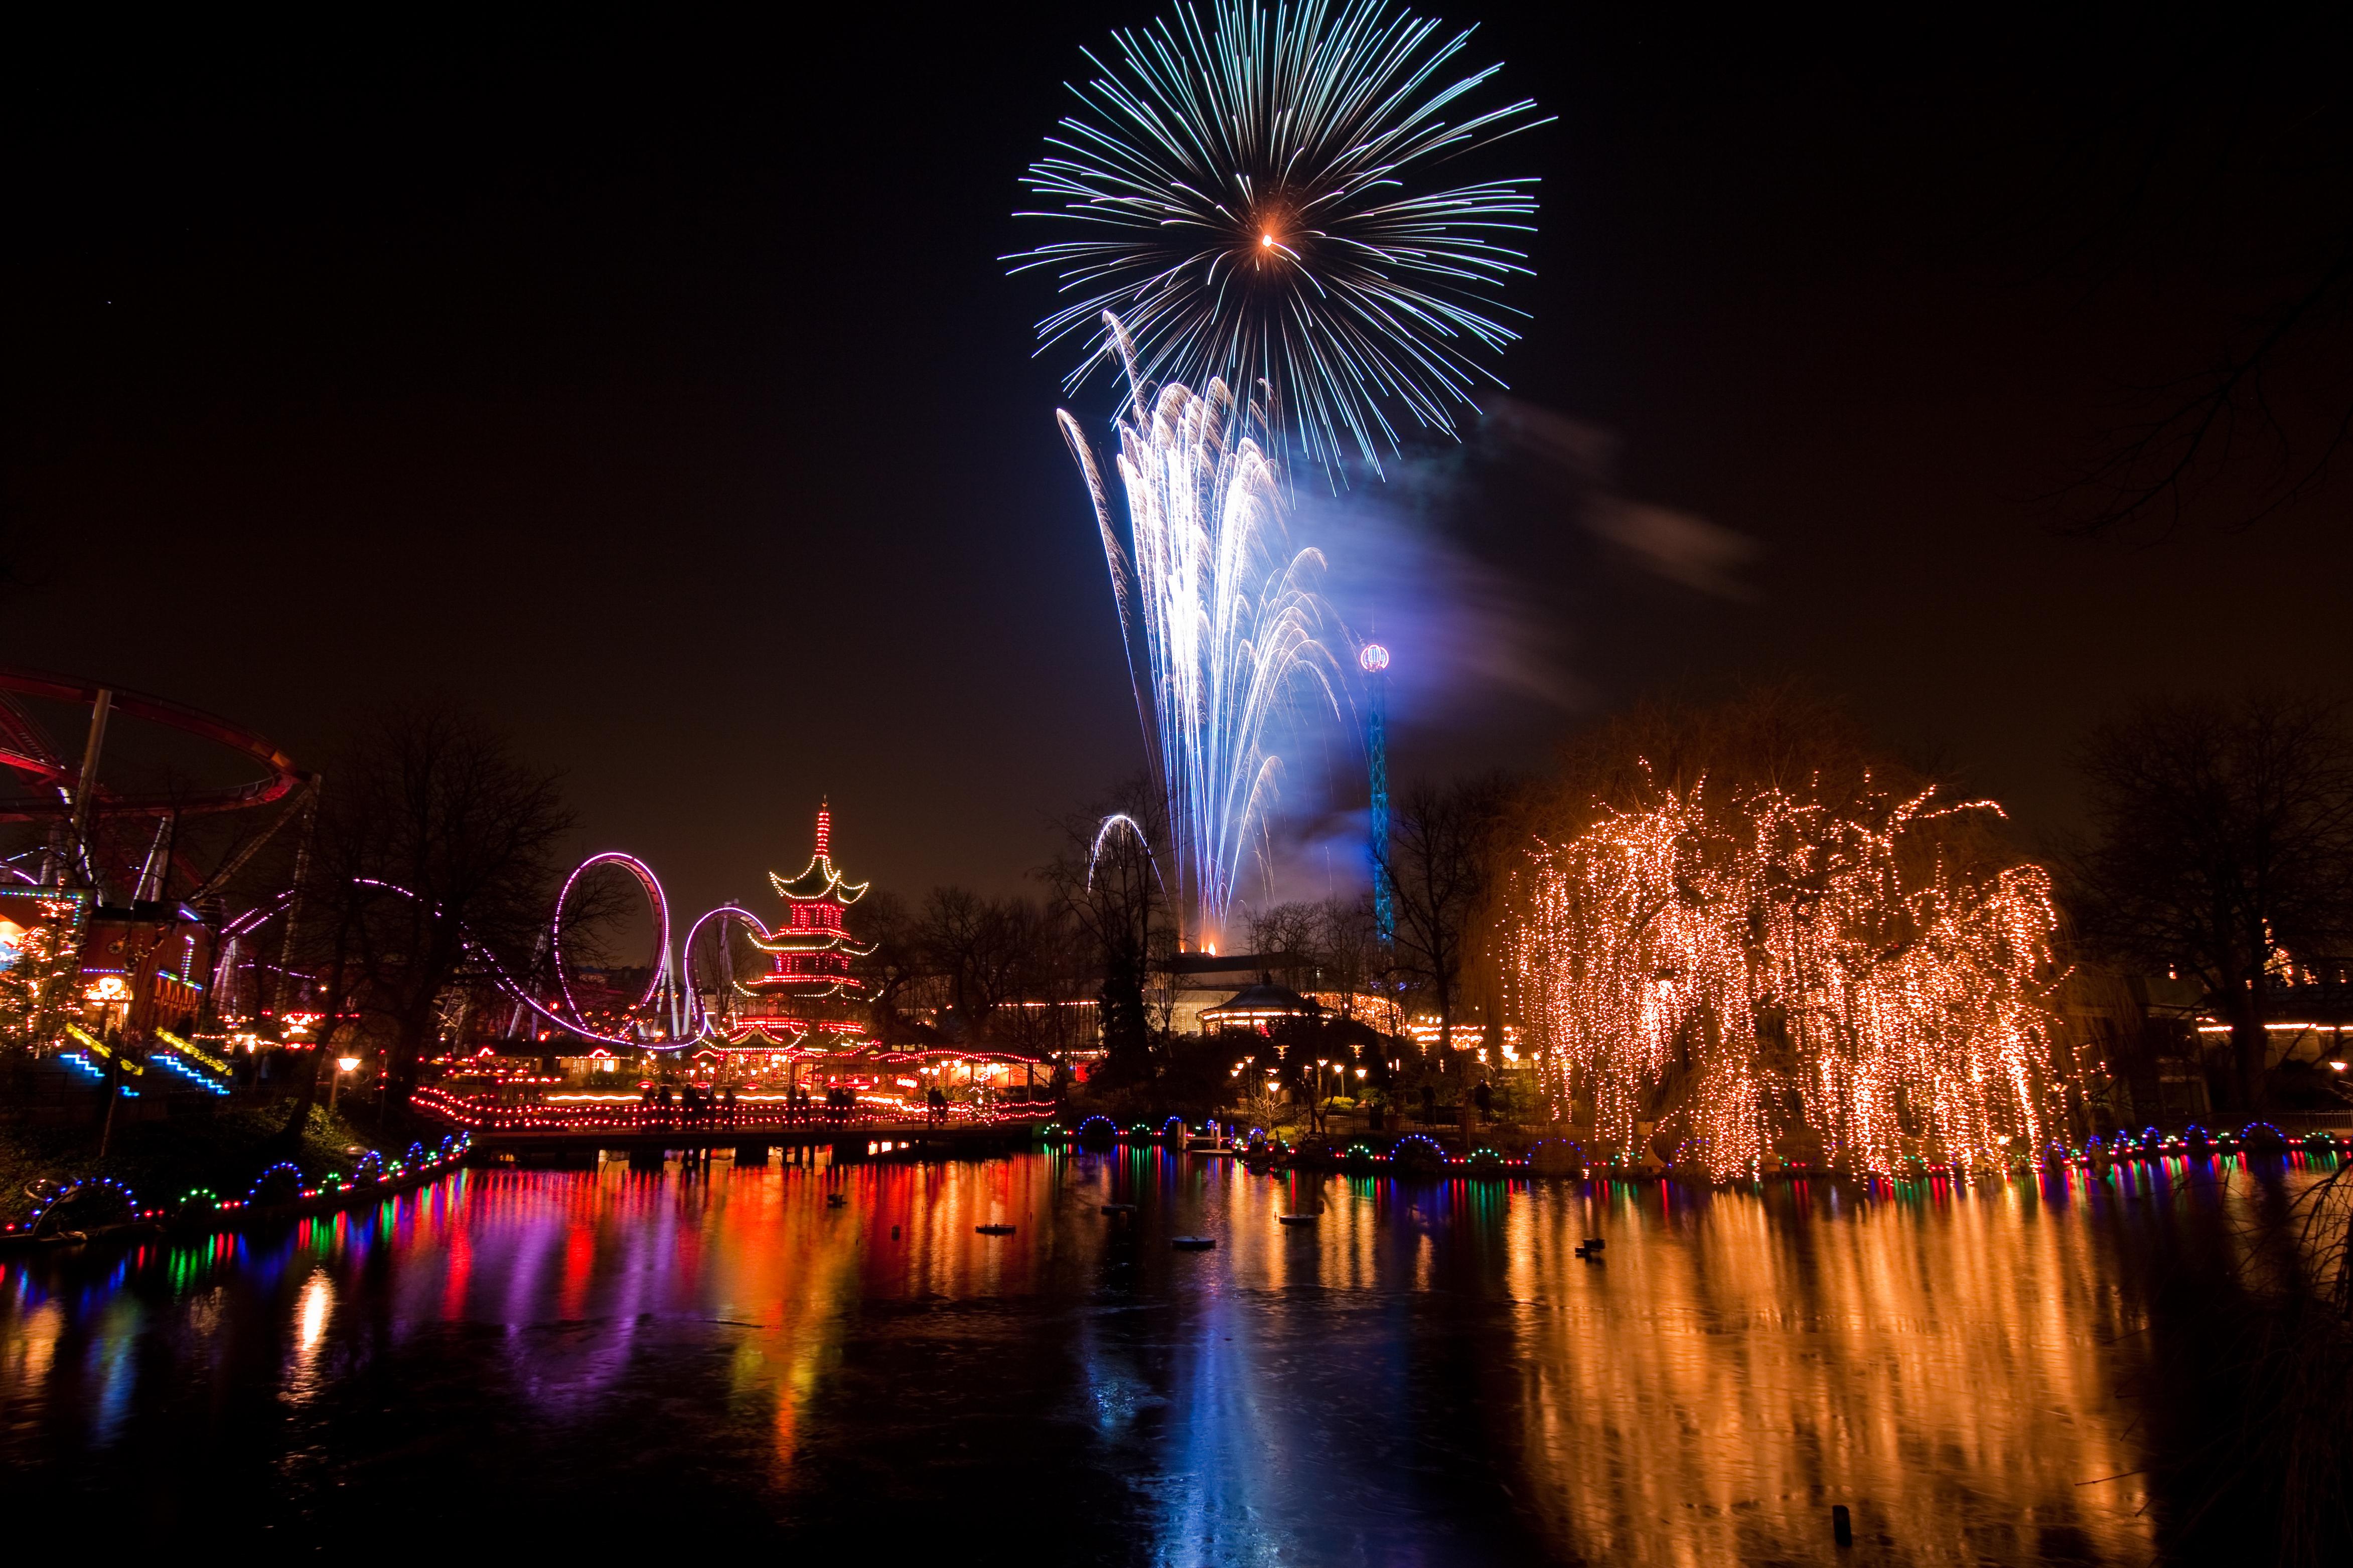 File:Tivoli fireworks.jpg